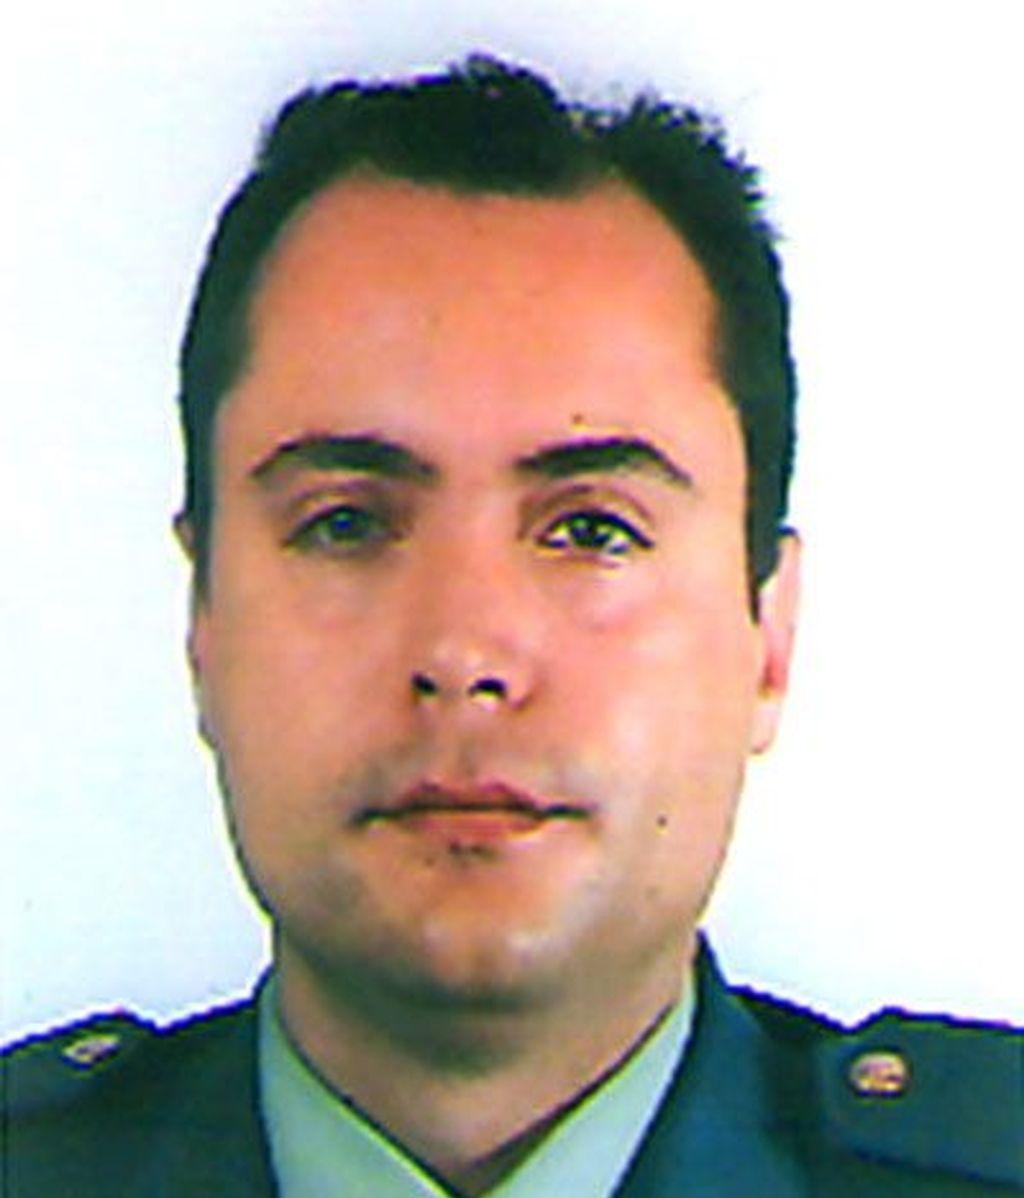 Imagen de la última víctima de ETA, Juan Manuel Piñuel Villalón